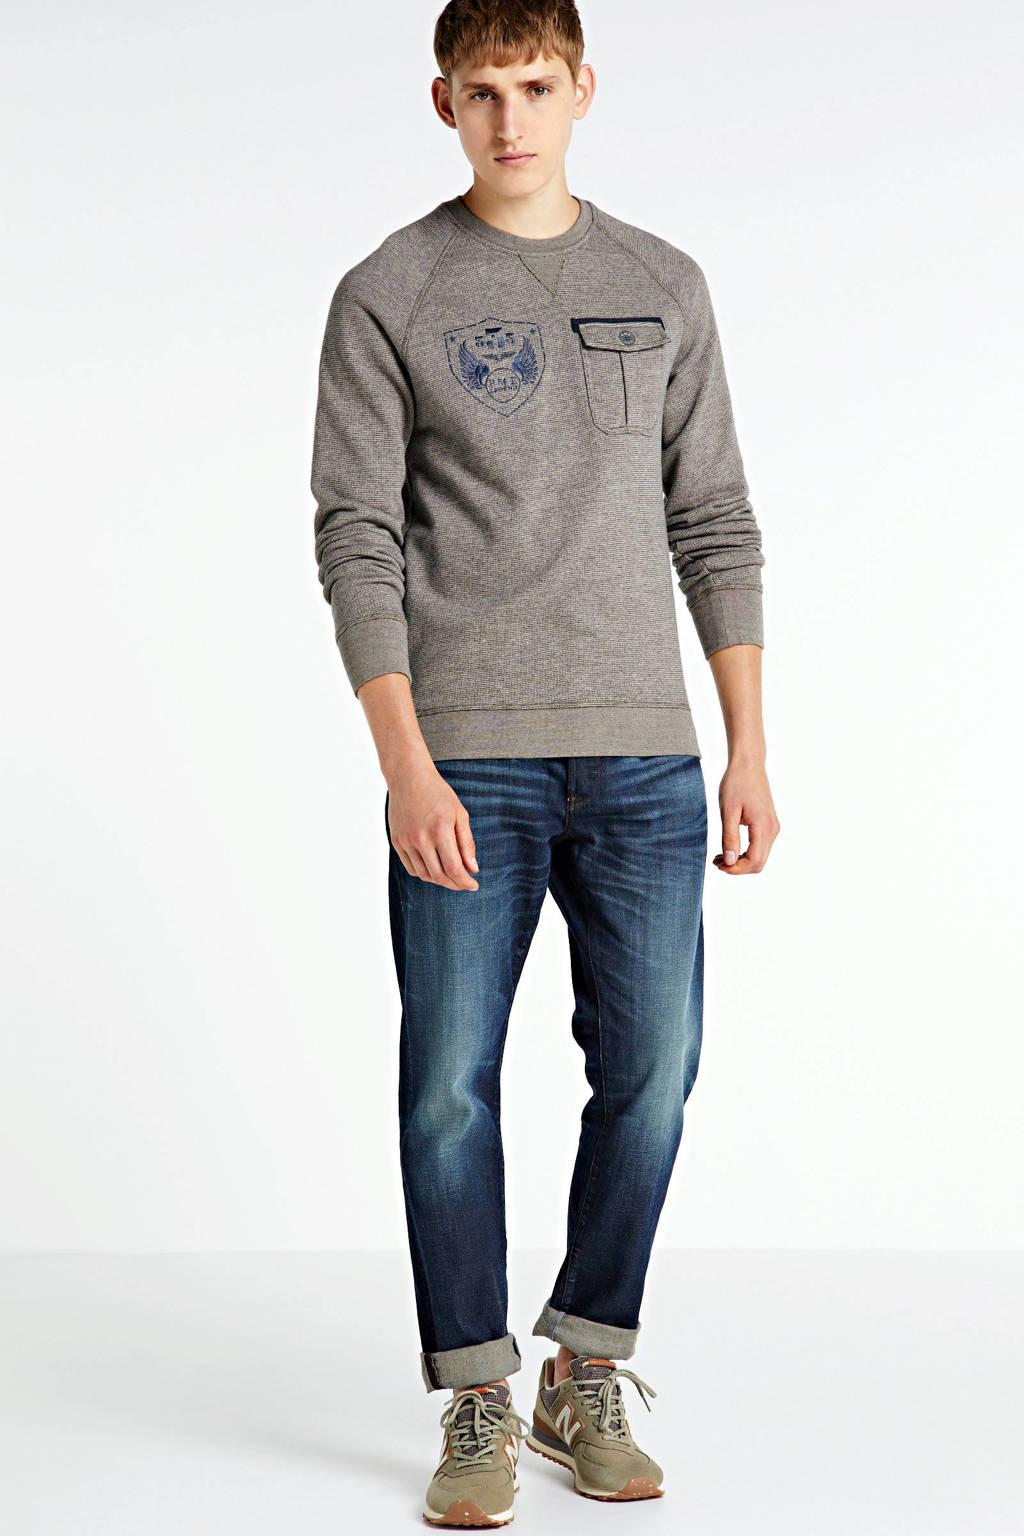 PME Legend gemêleerde sweater beige/donkerblauw, Beige/donkerblauw